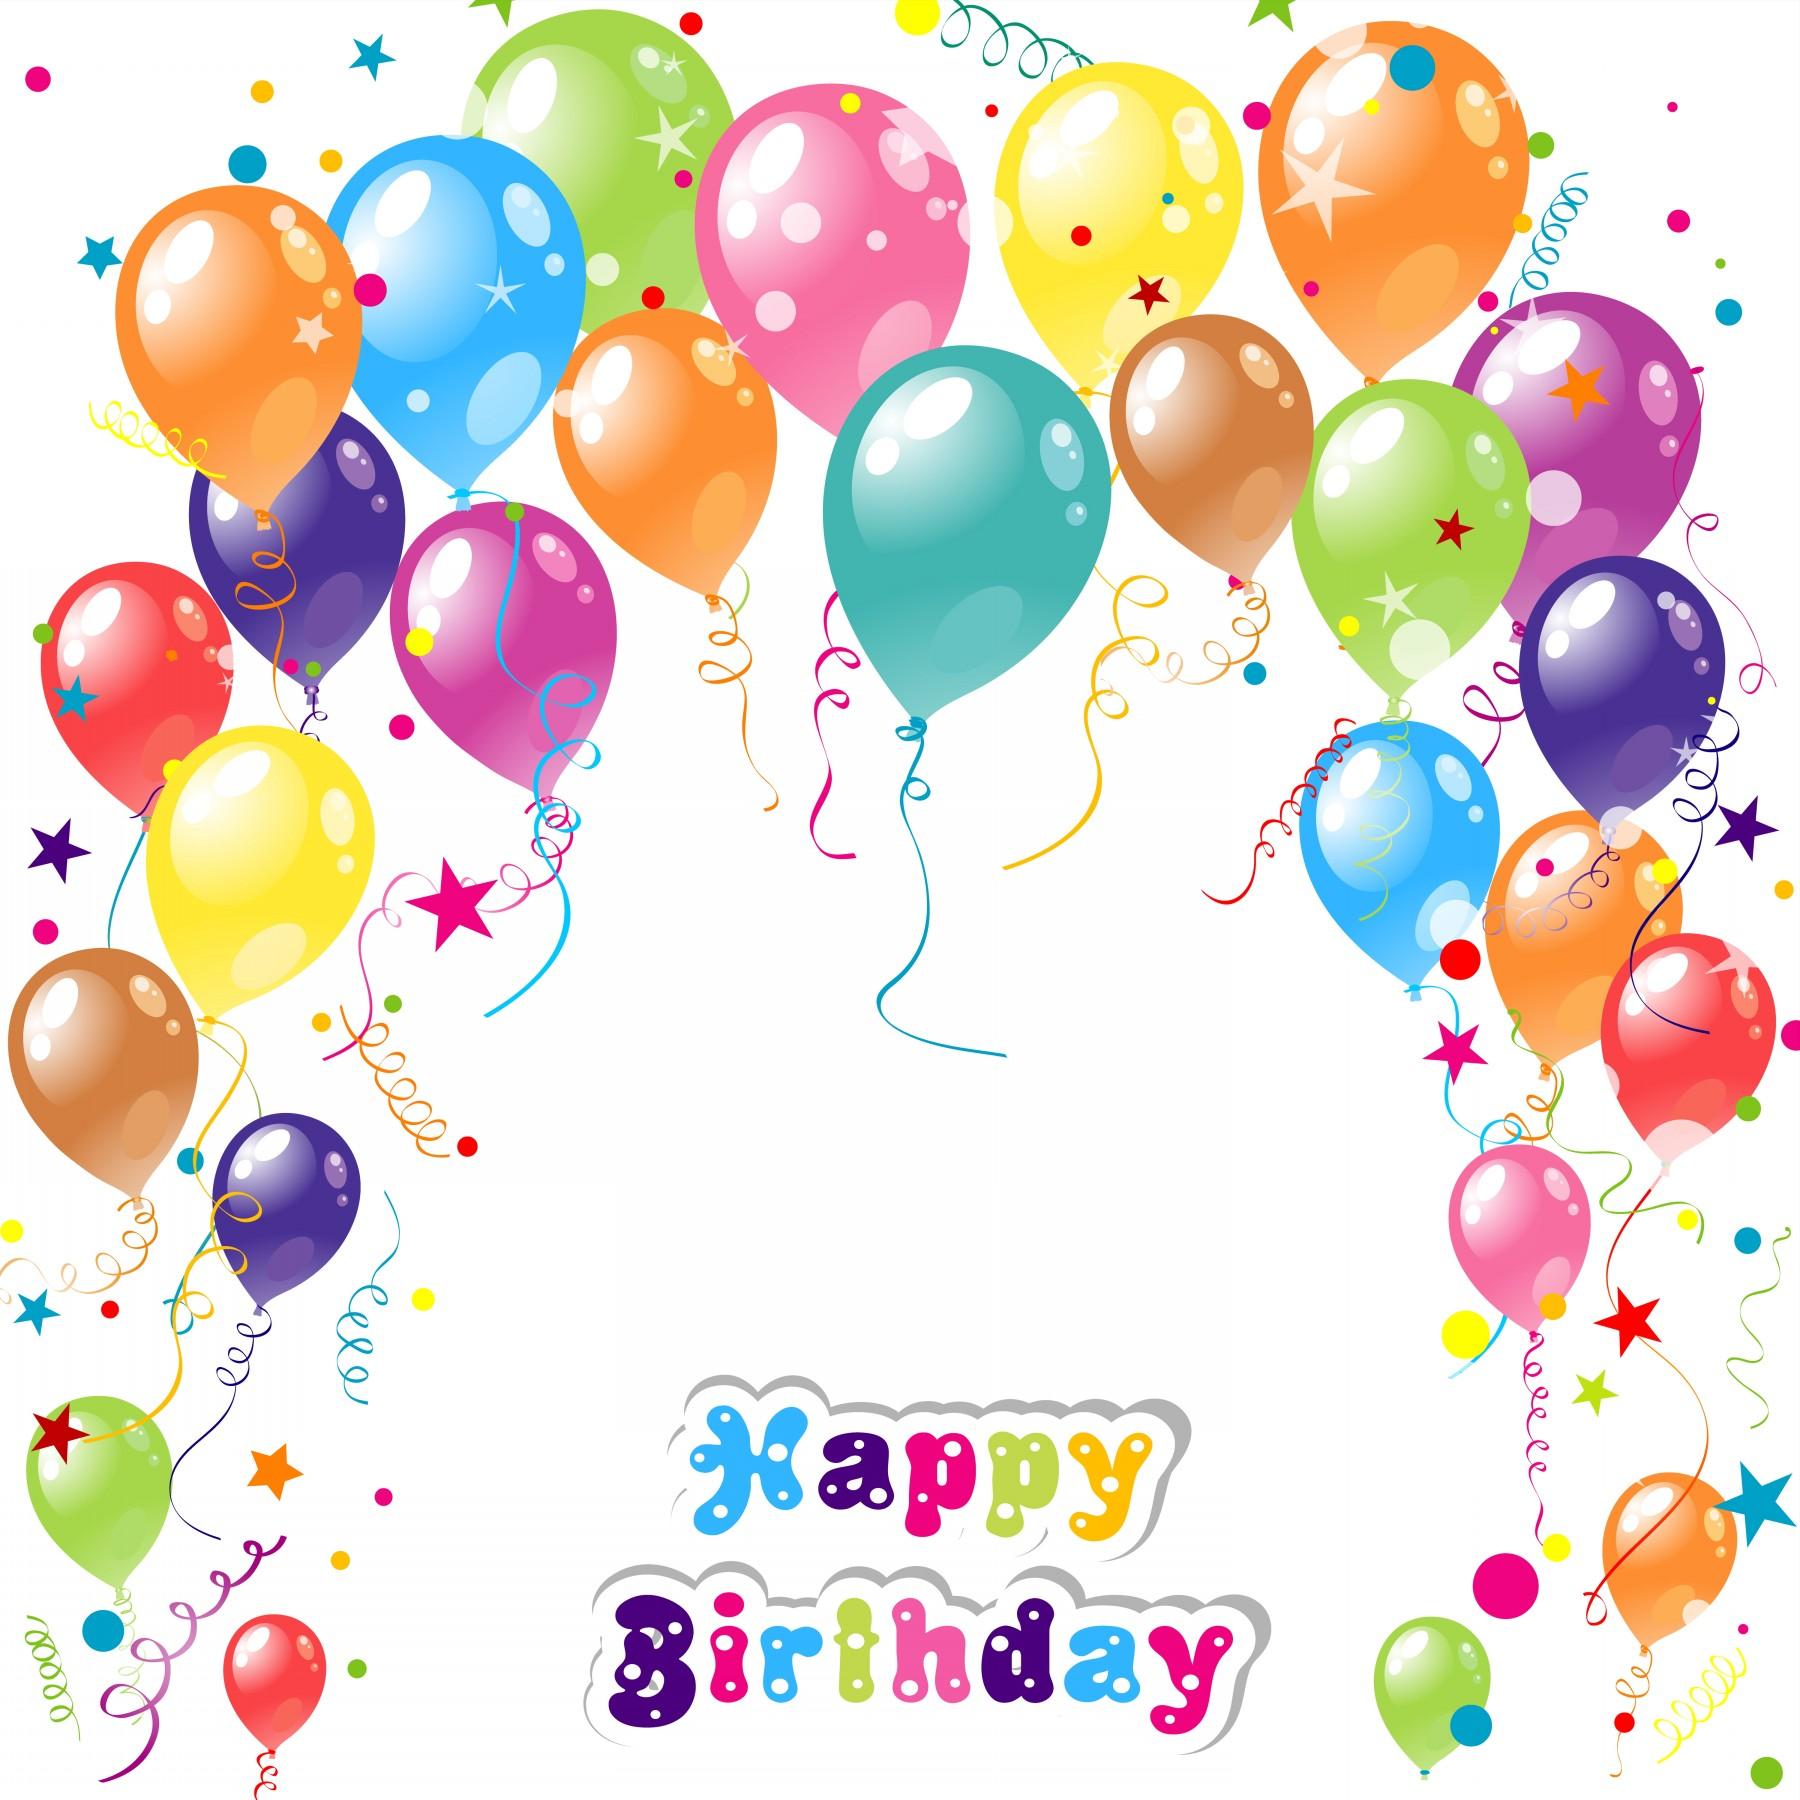 15 Happy Birthday Cards New Designs Elsoar 1800x1800